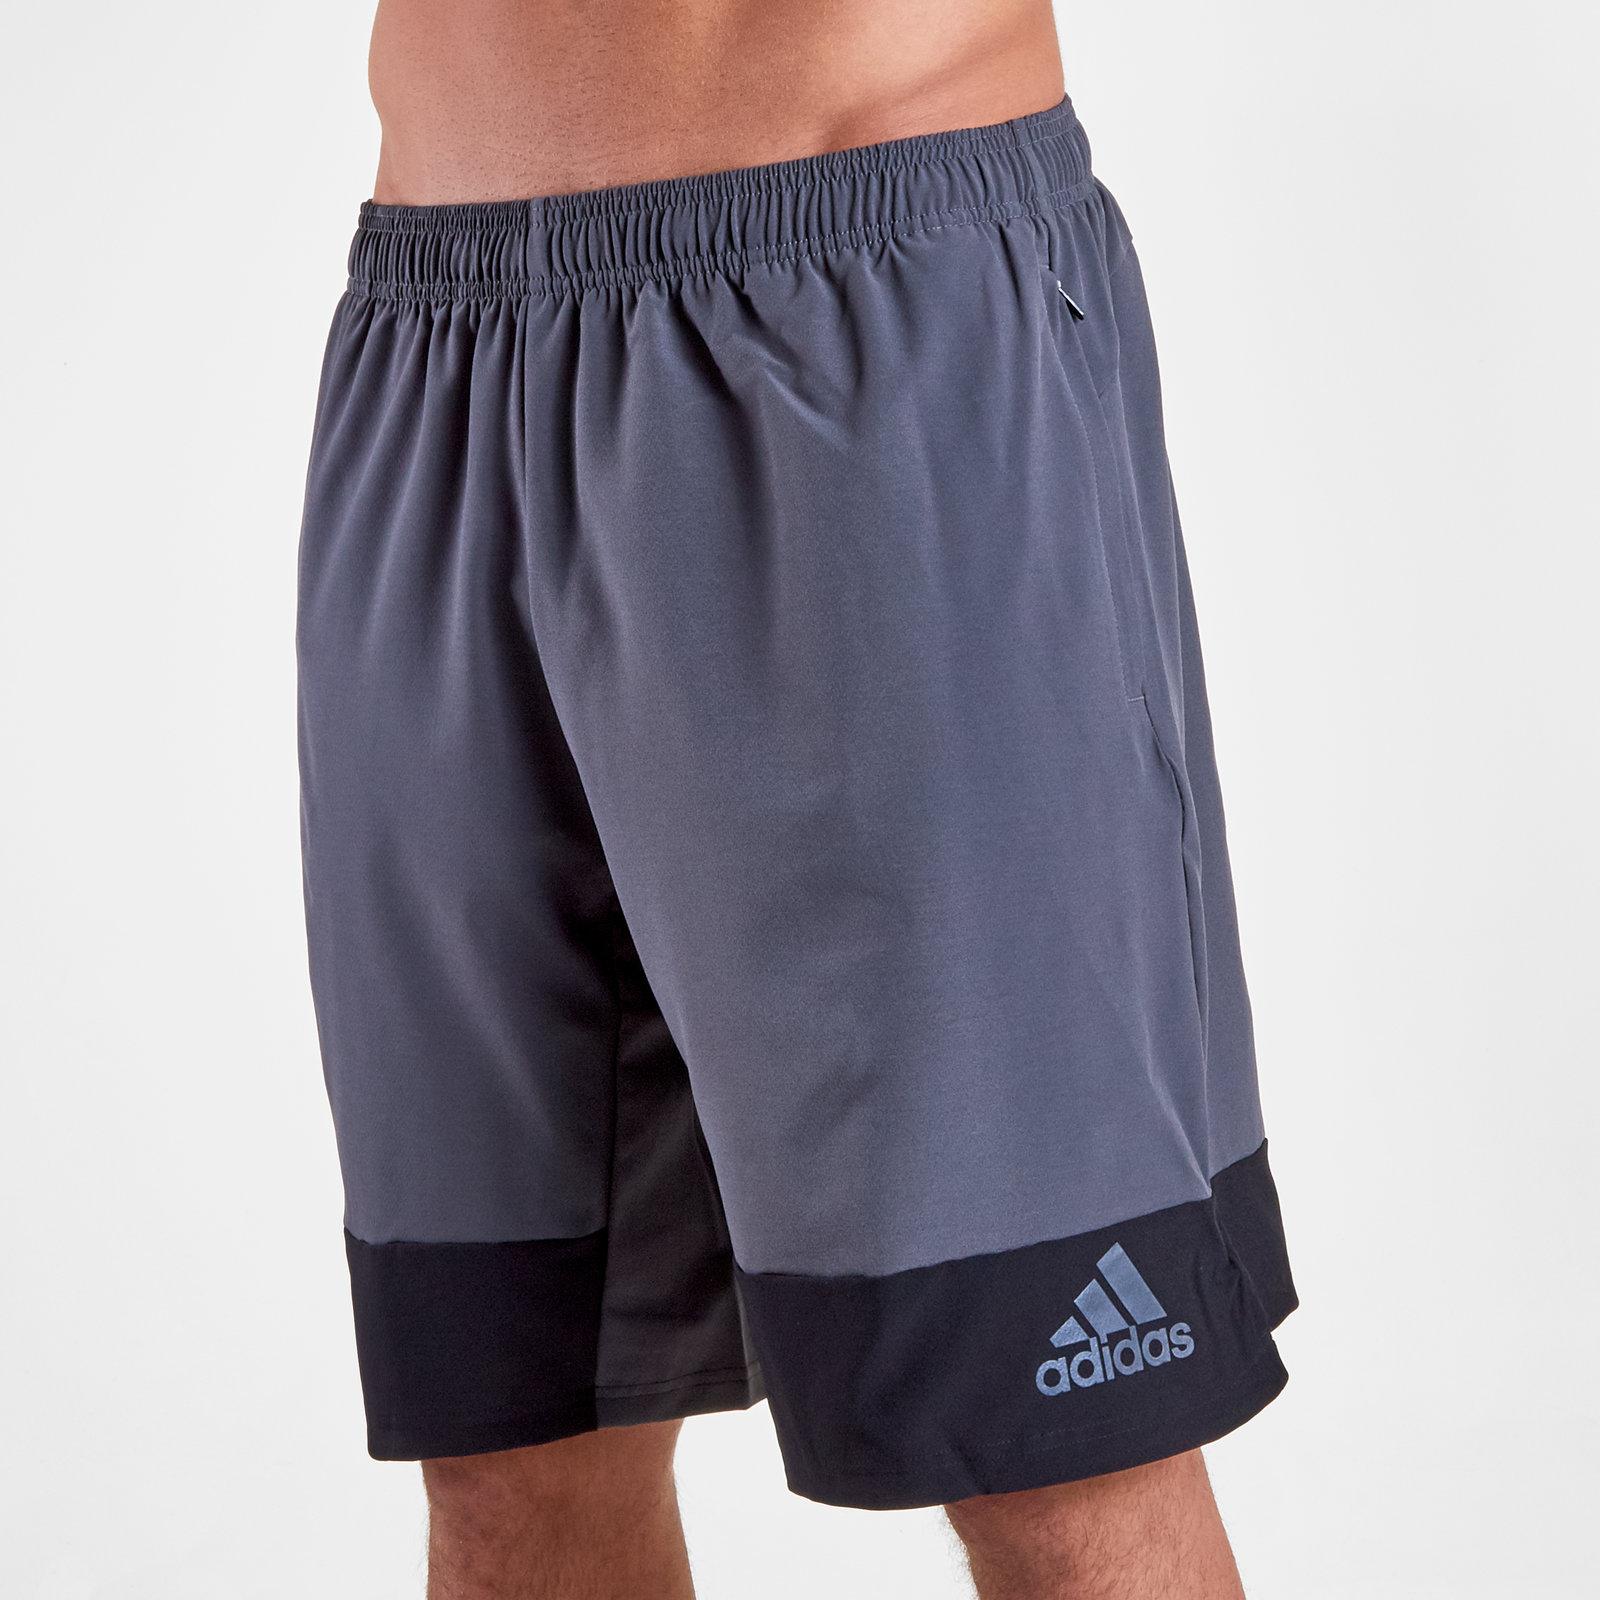 4K Tech Shorts